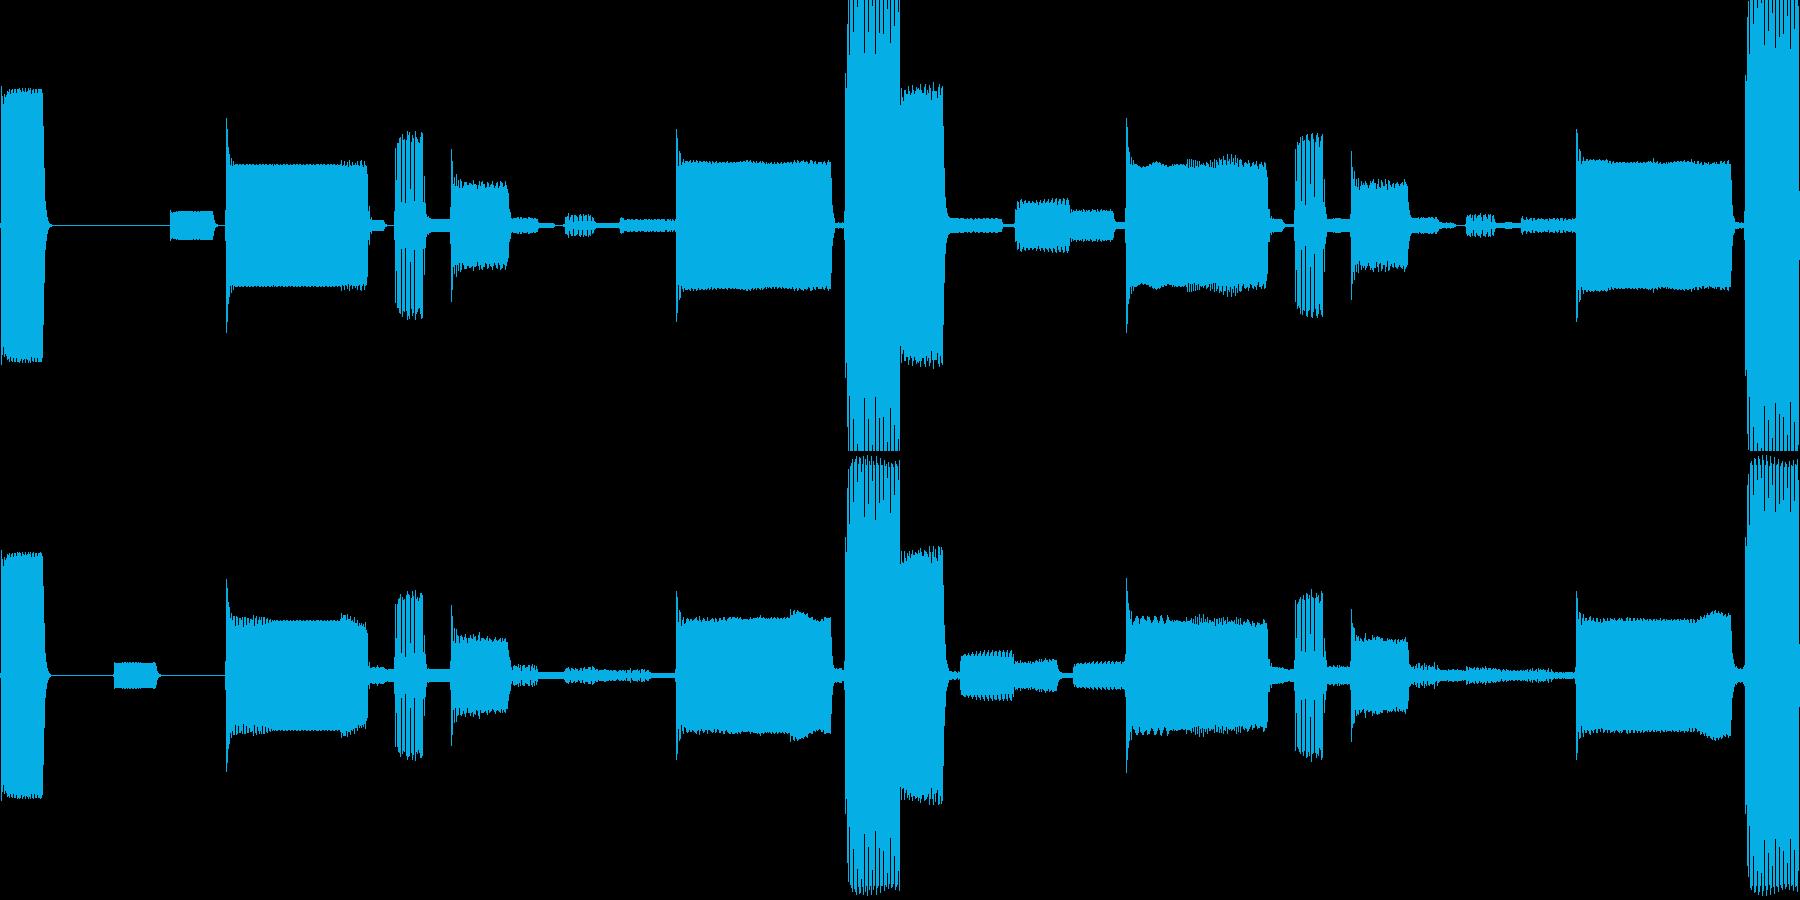 k008 アラーム音(ループ仕様)の再生済みの波形